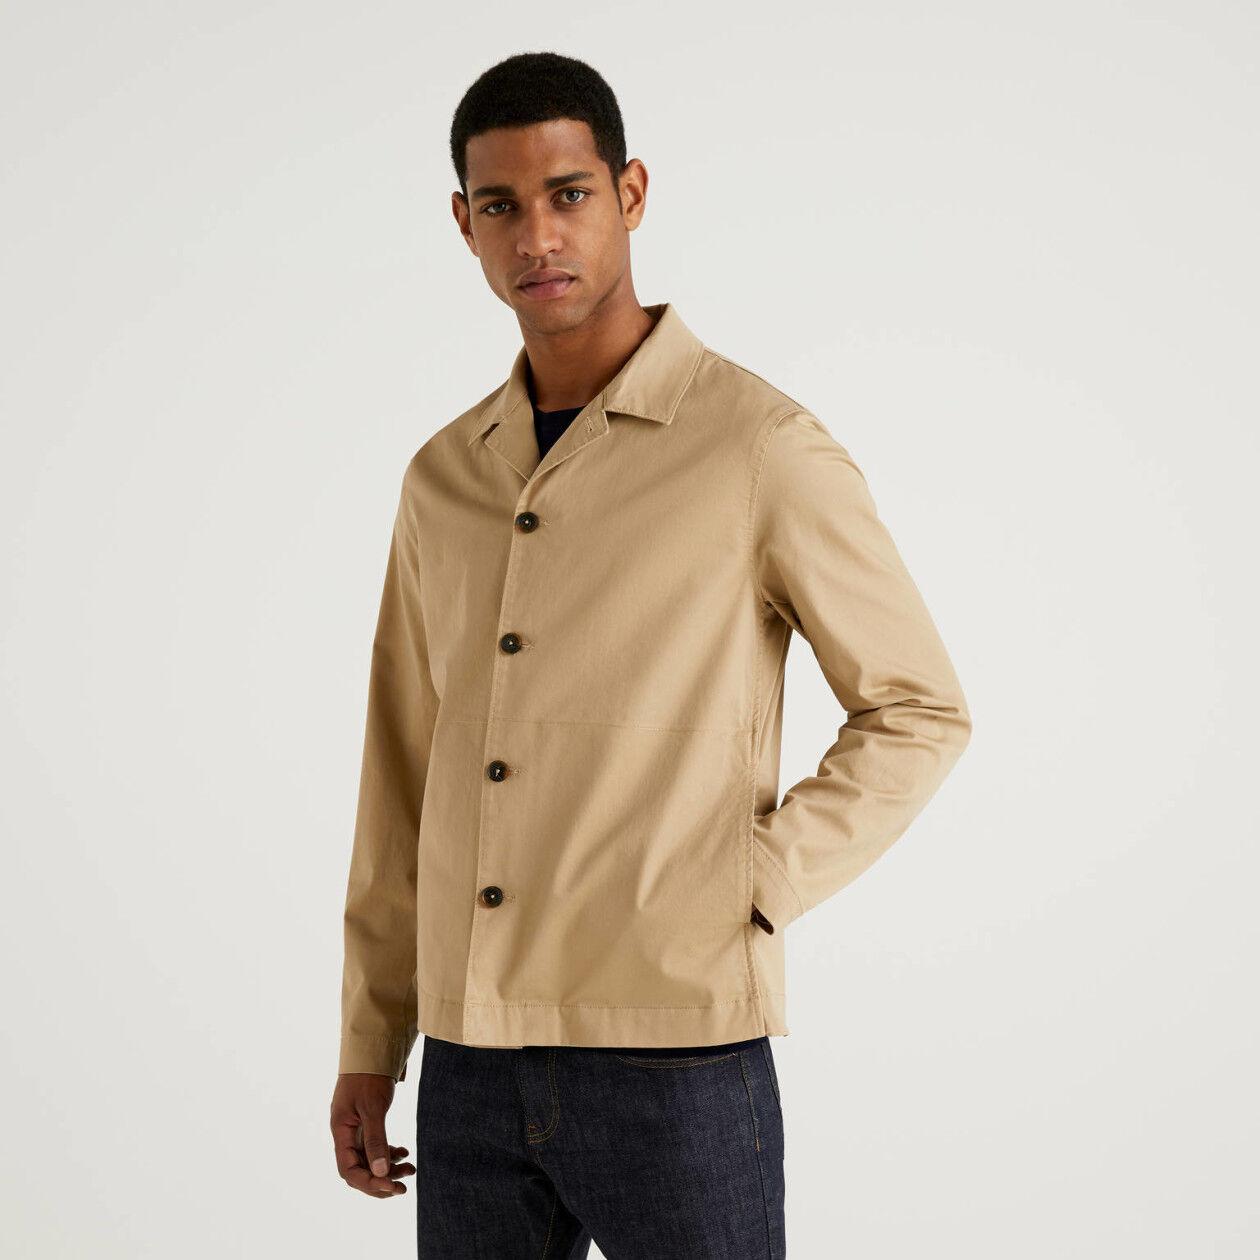 Stretch cotton jacket